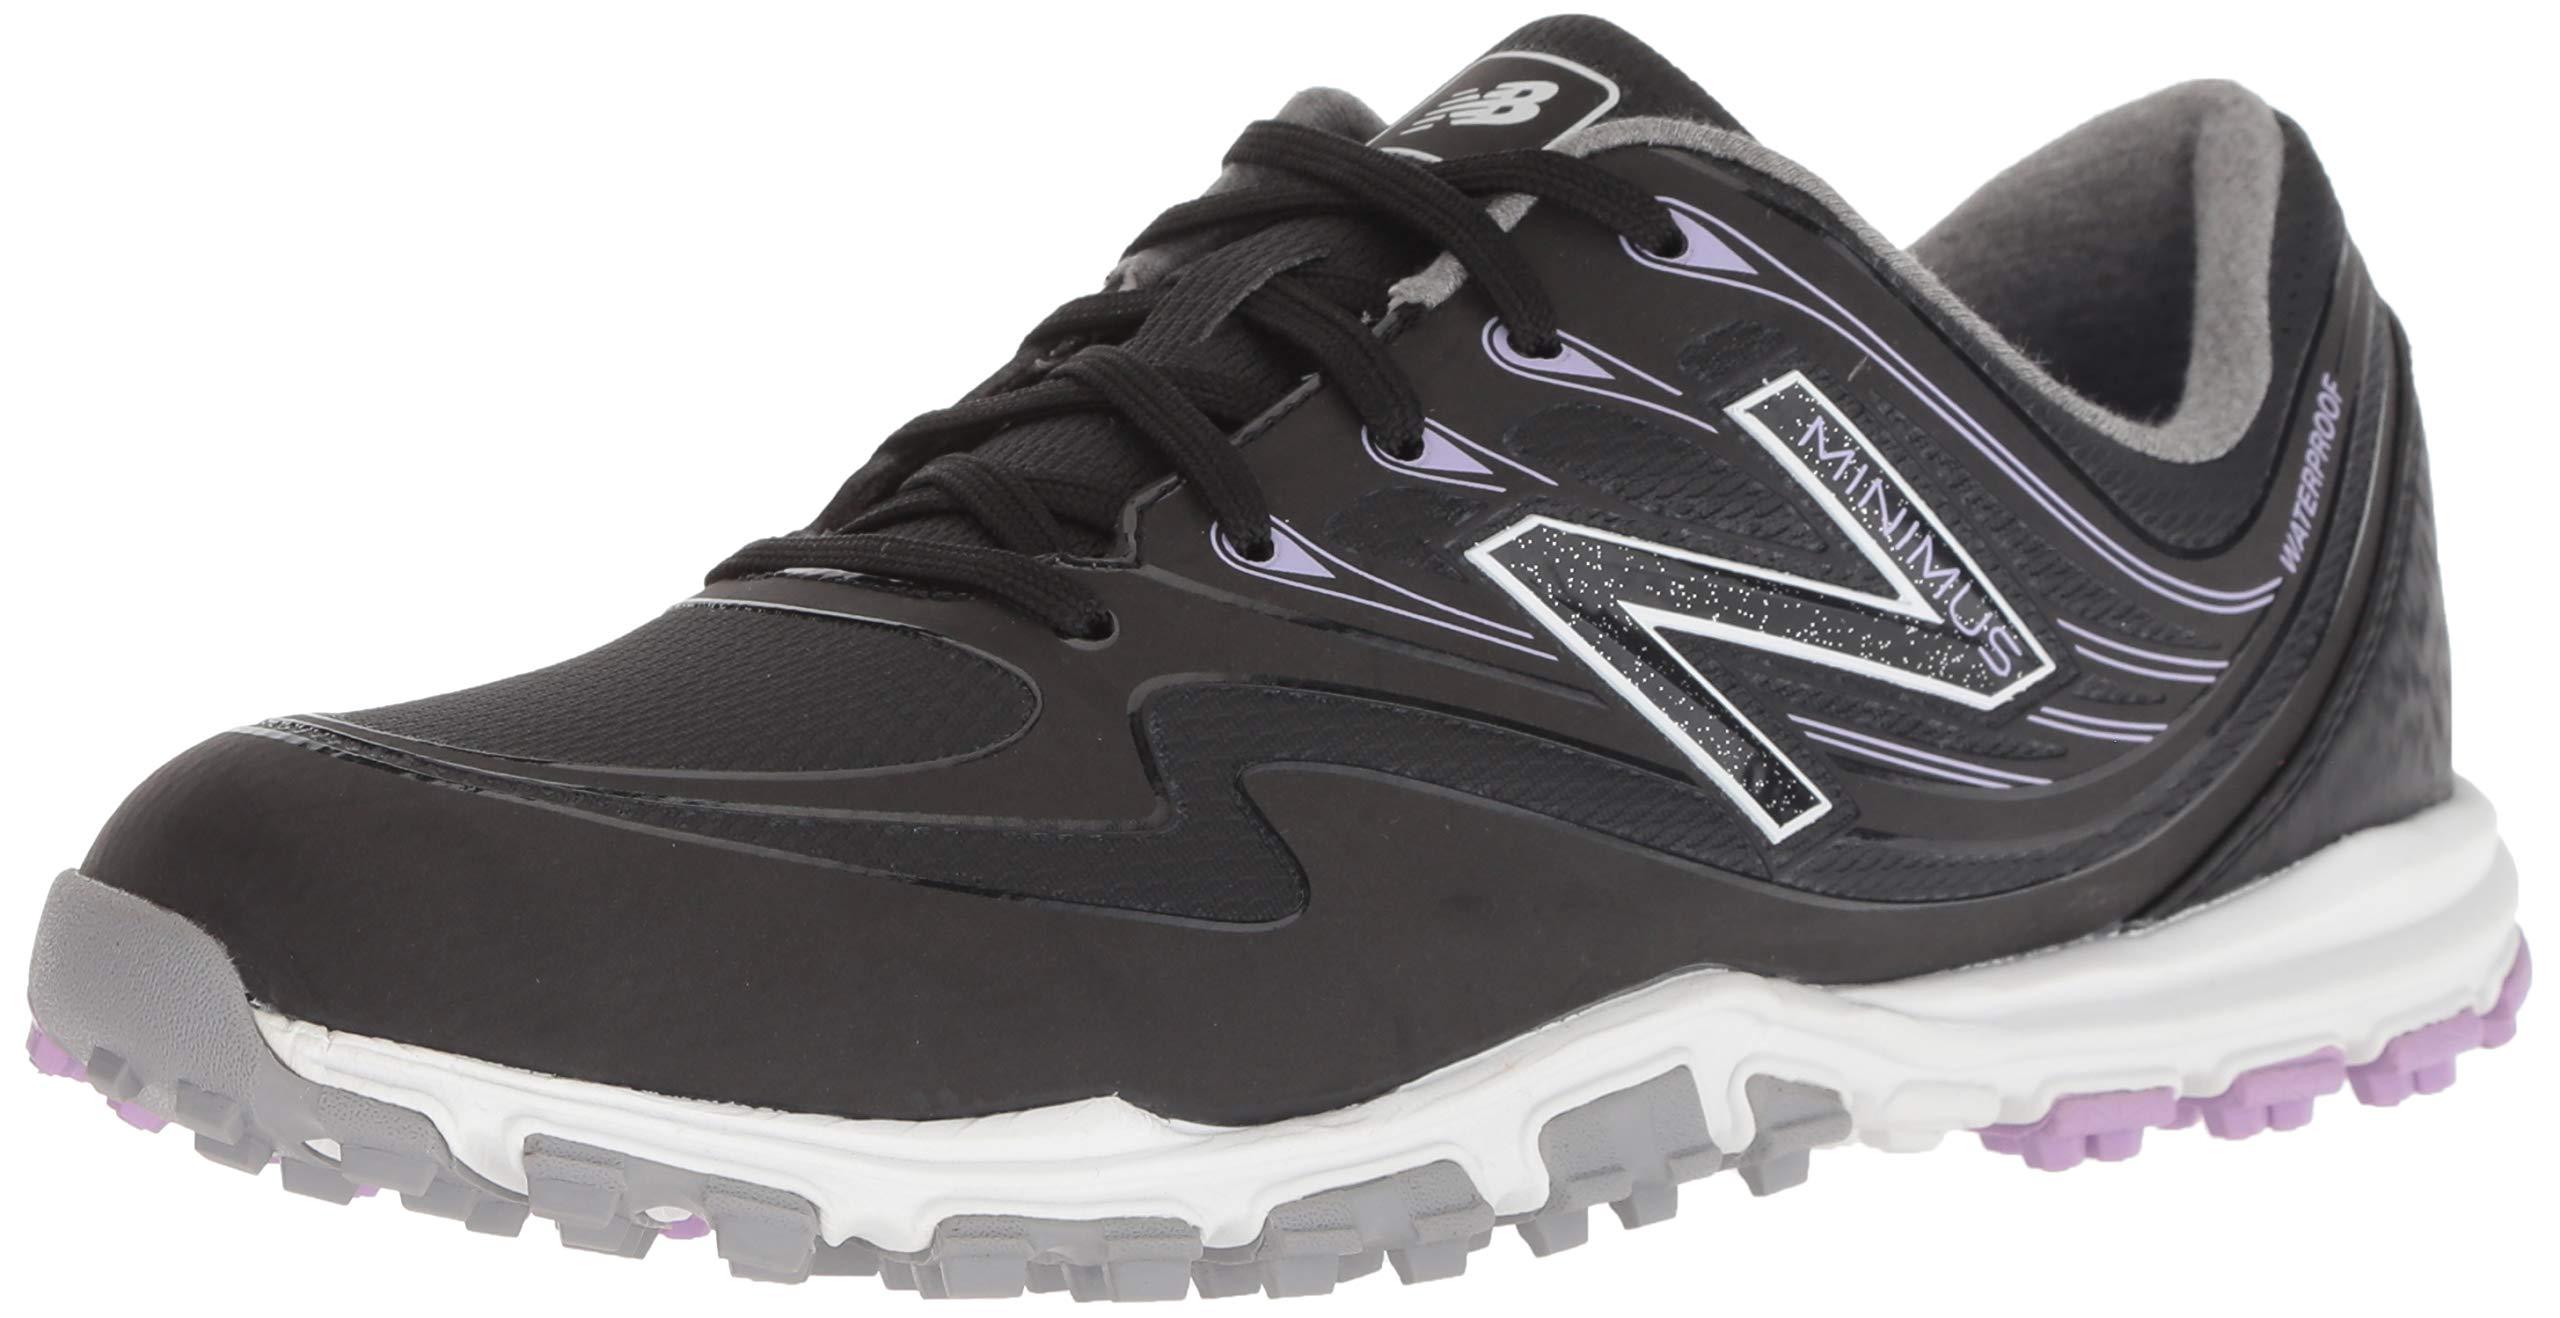 New Balance Women's Minimus WP Waterproof Spikeless Comfort Golf Shoe, Black/Purple, 6.5 M US